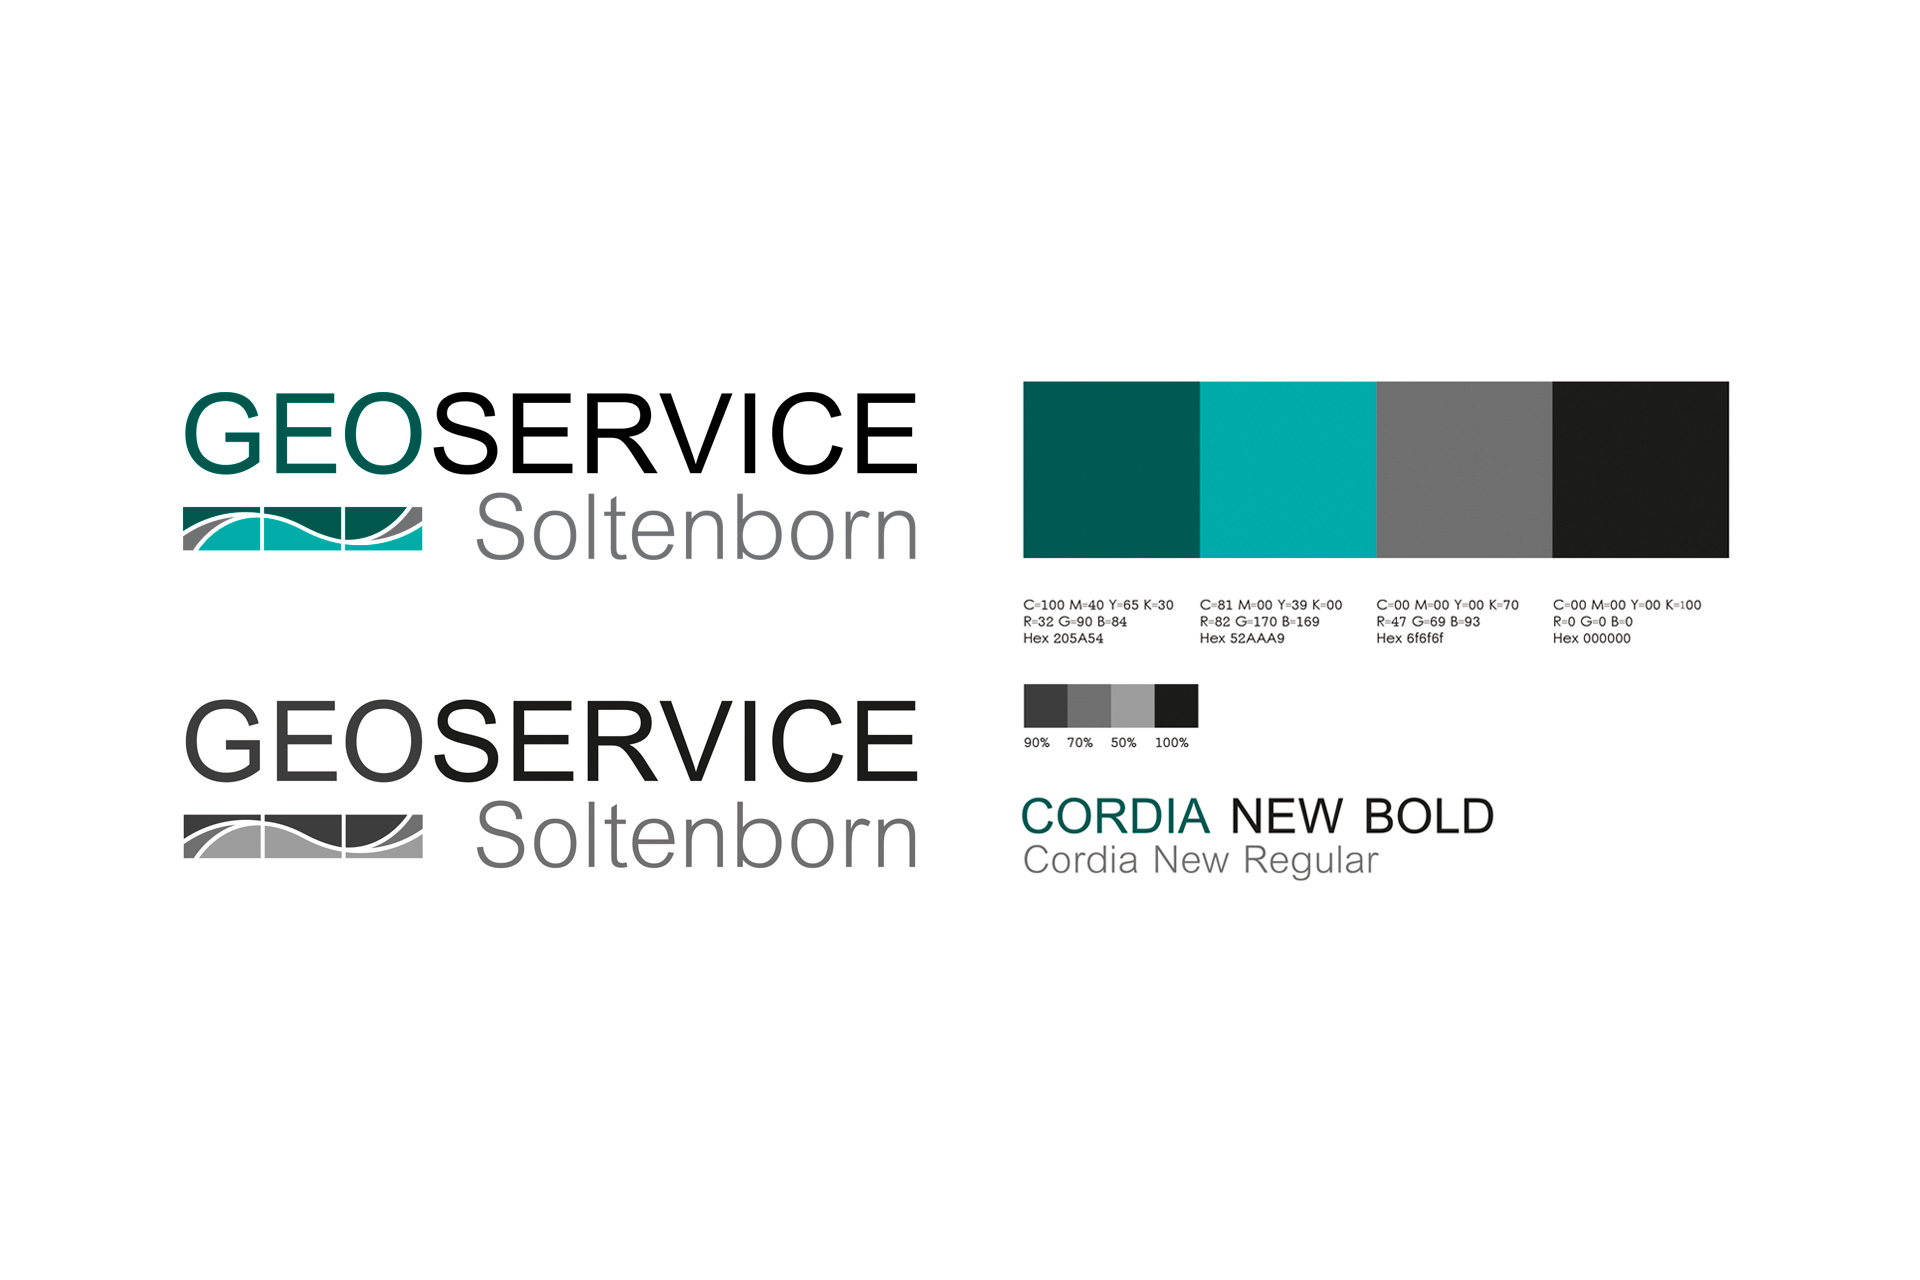 geoservice-soltenborn-stylesheet